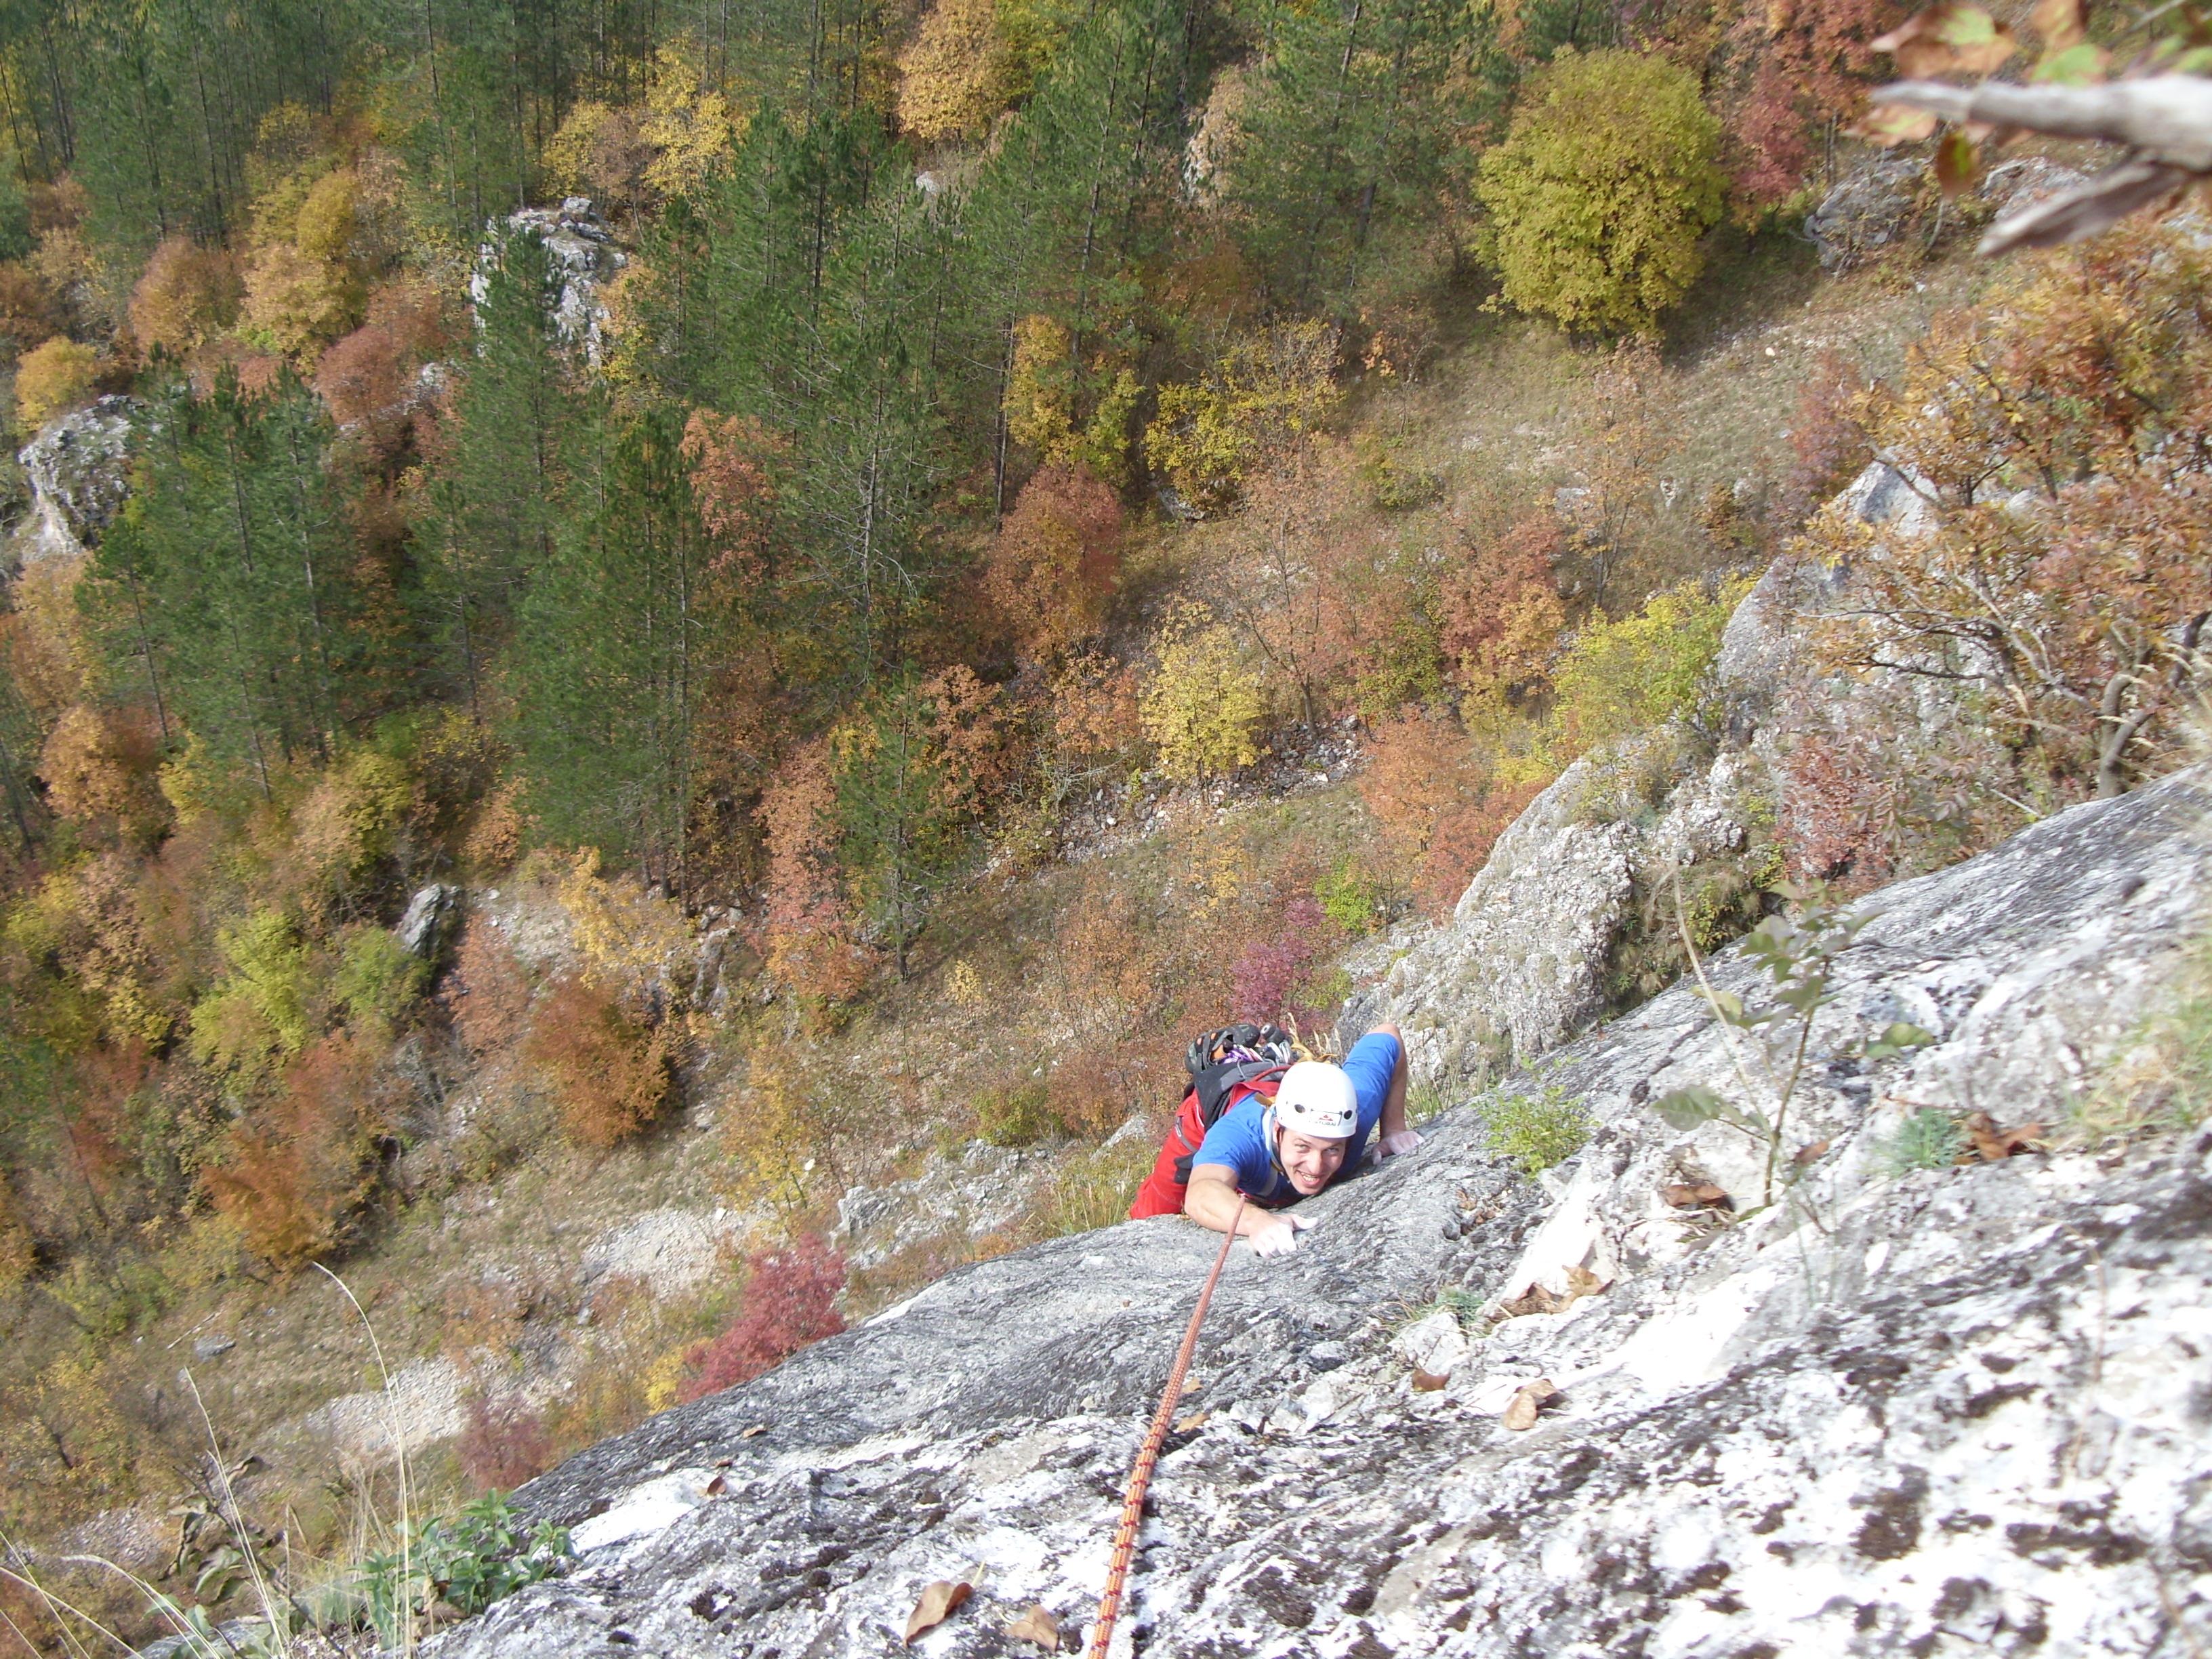 Erma river gorge